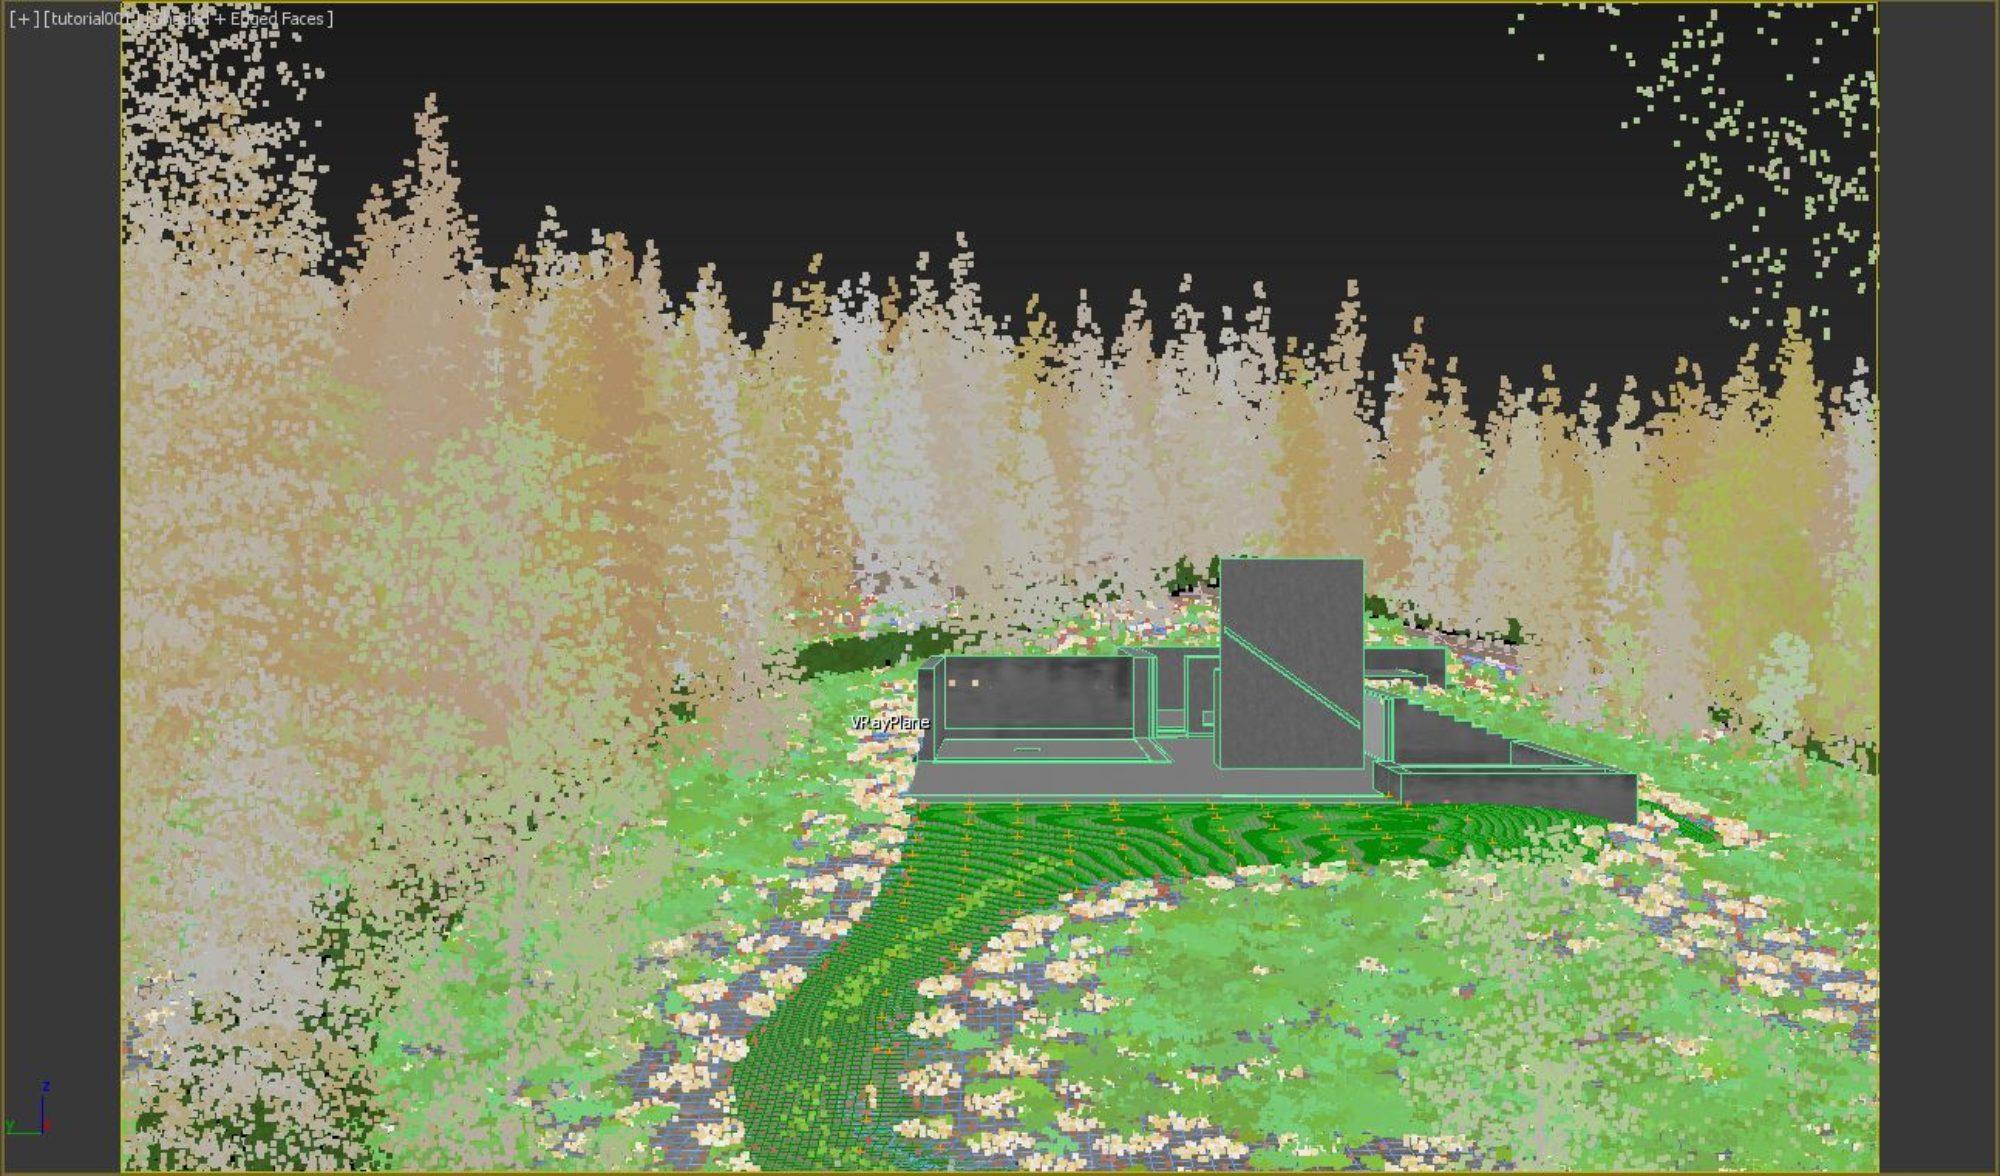 Carey House Tutorial 03 - Trees